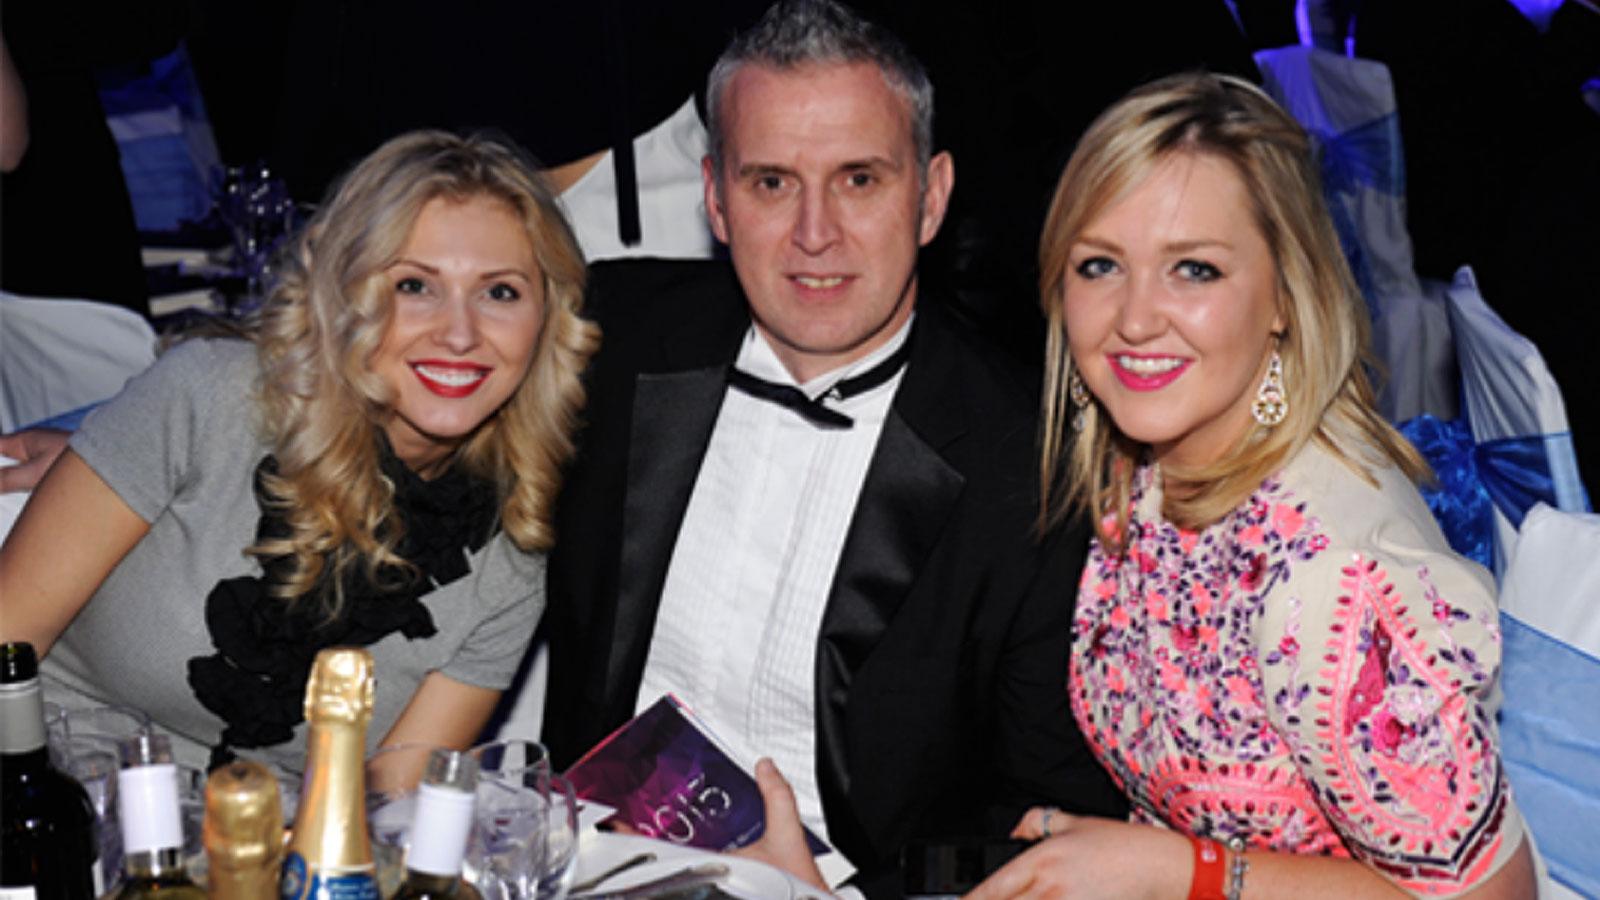 Asite Sponsored; The Building Awards 2015, Grosvenor House Hotel, London 22nd April 2015